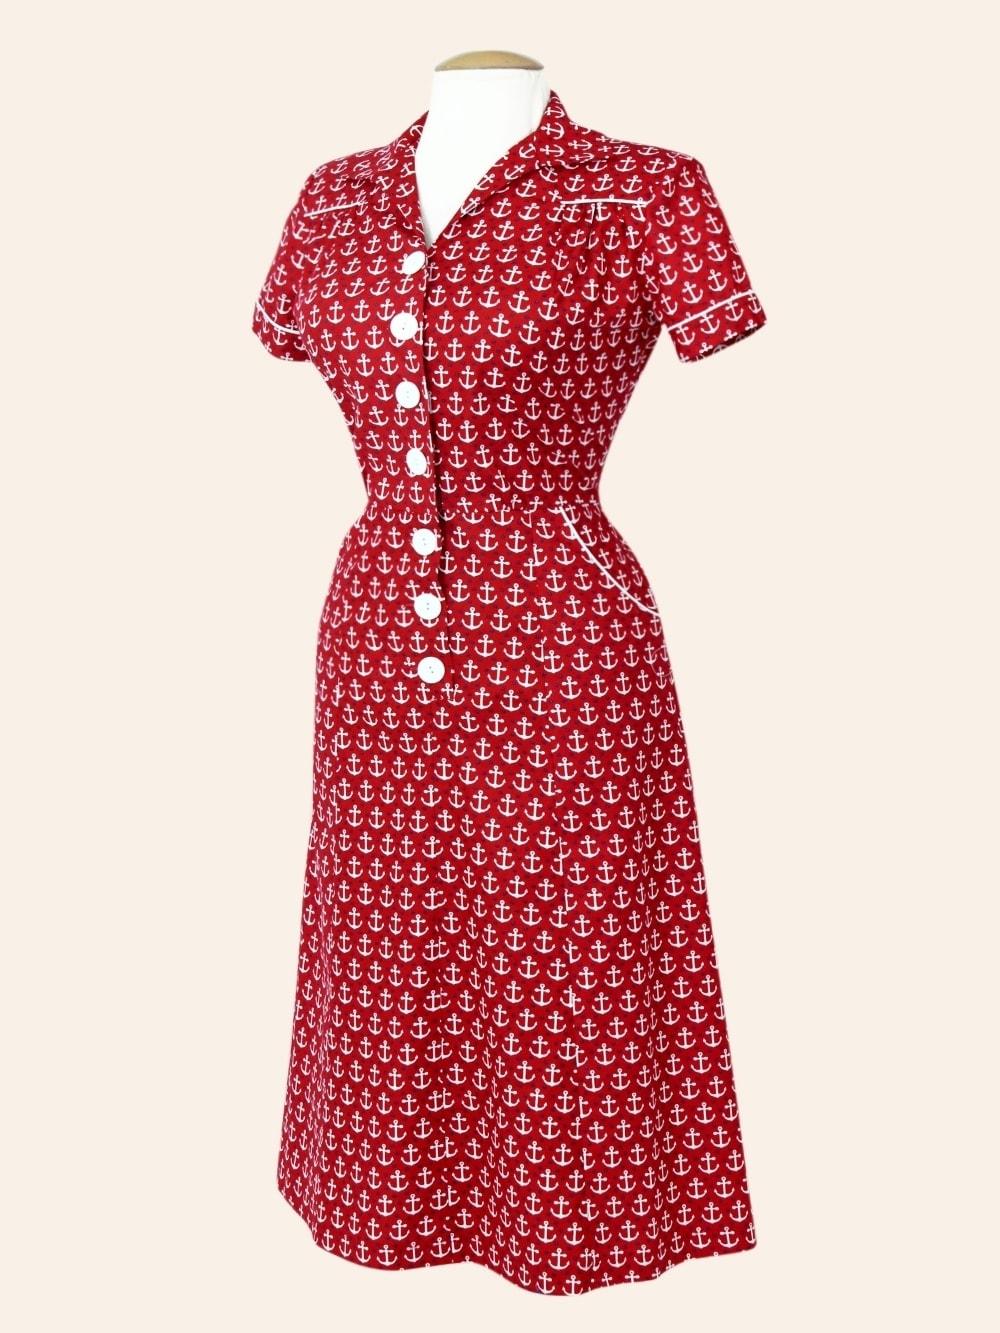 Vintage Red Tea Dress